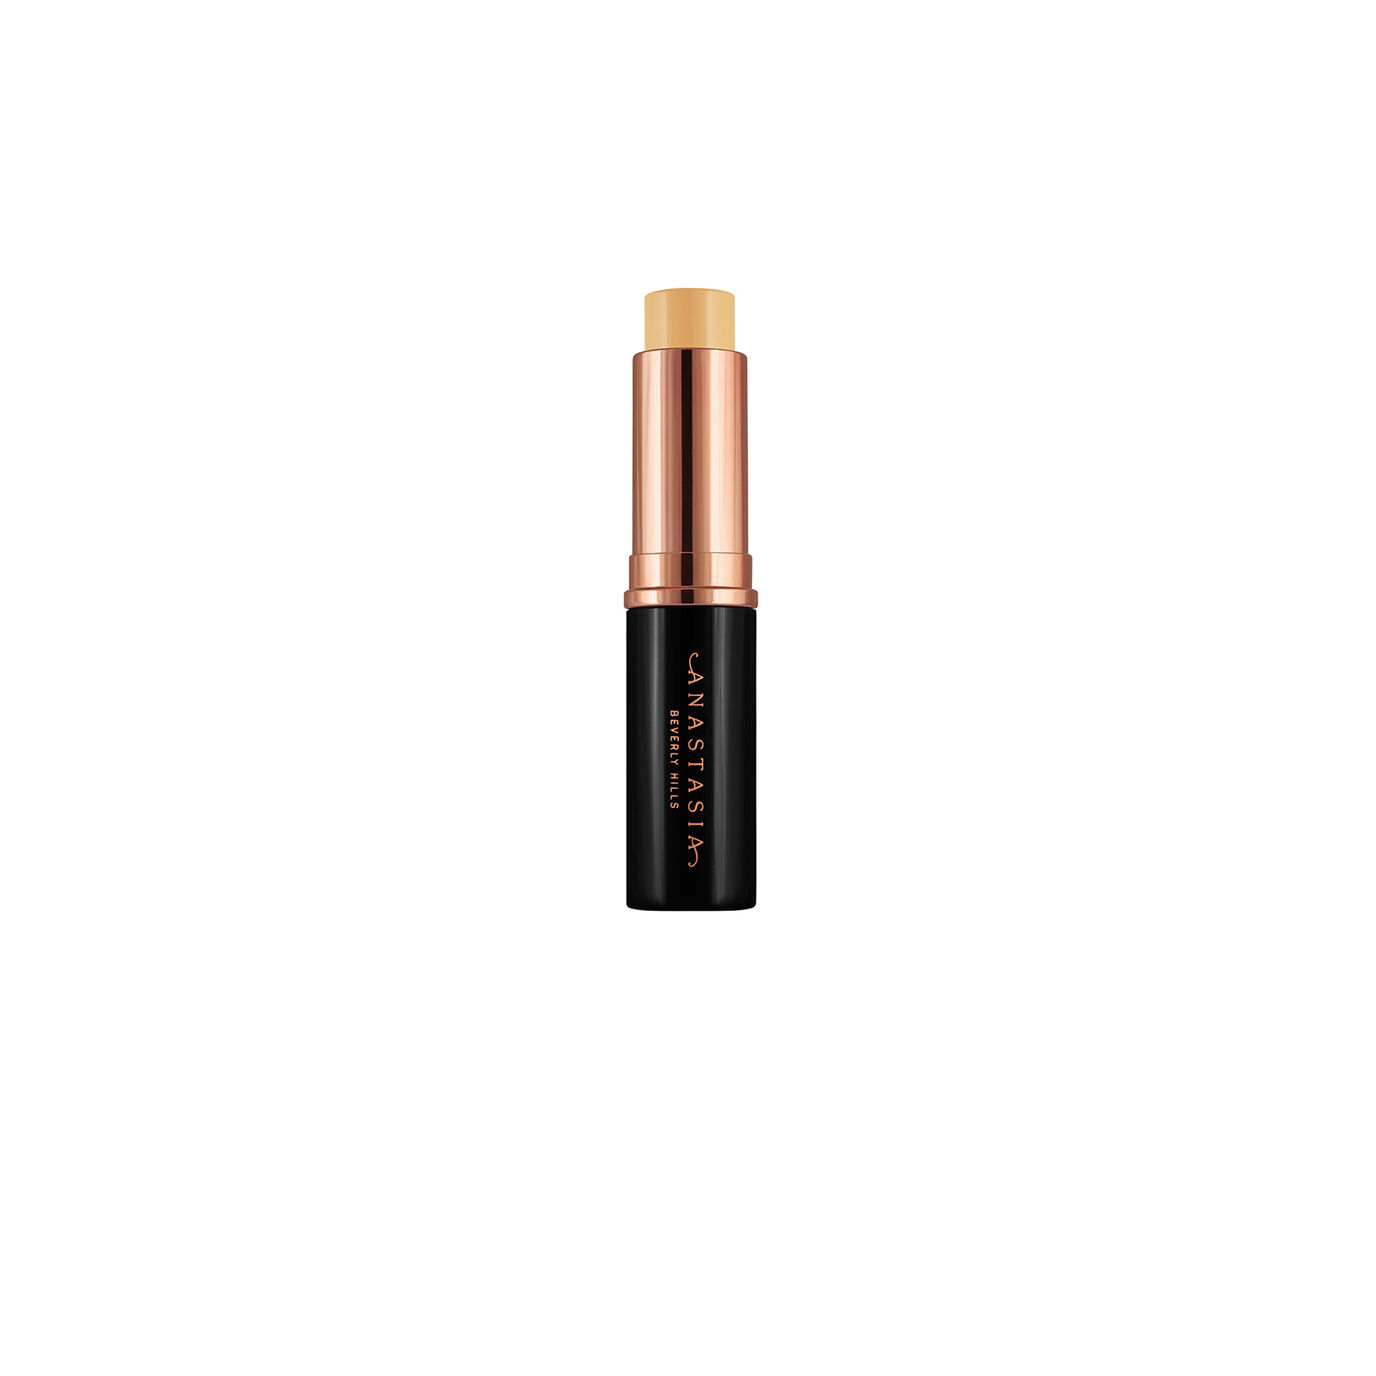 Stick Foundation - Amber